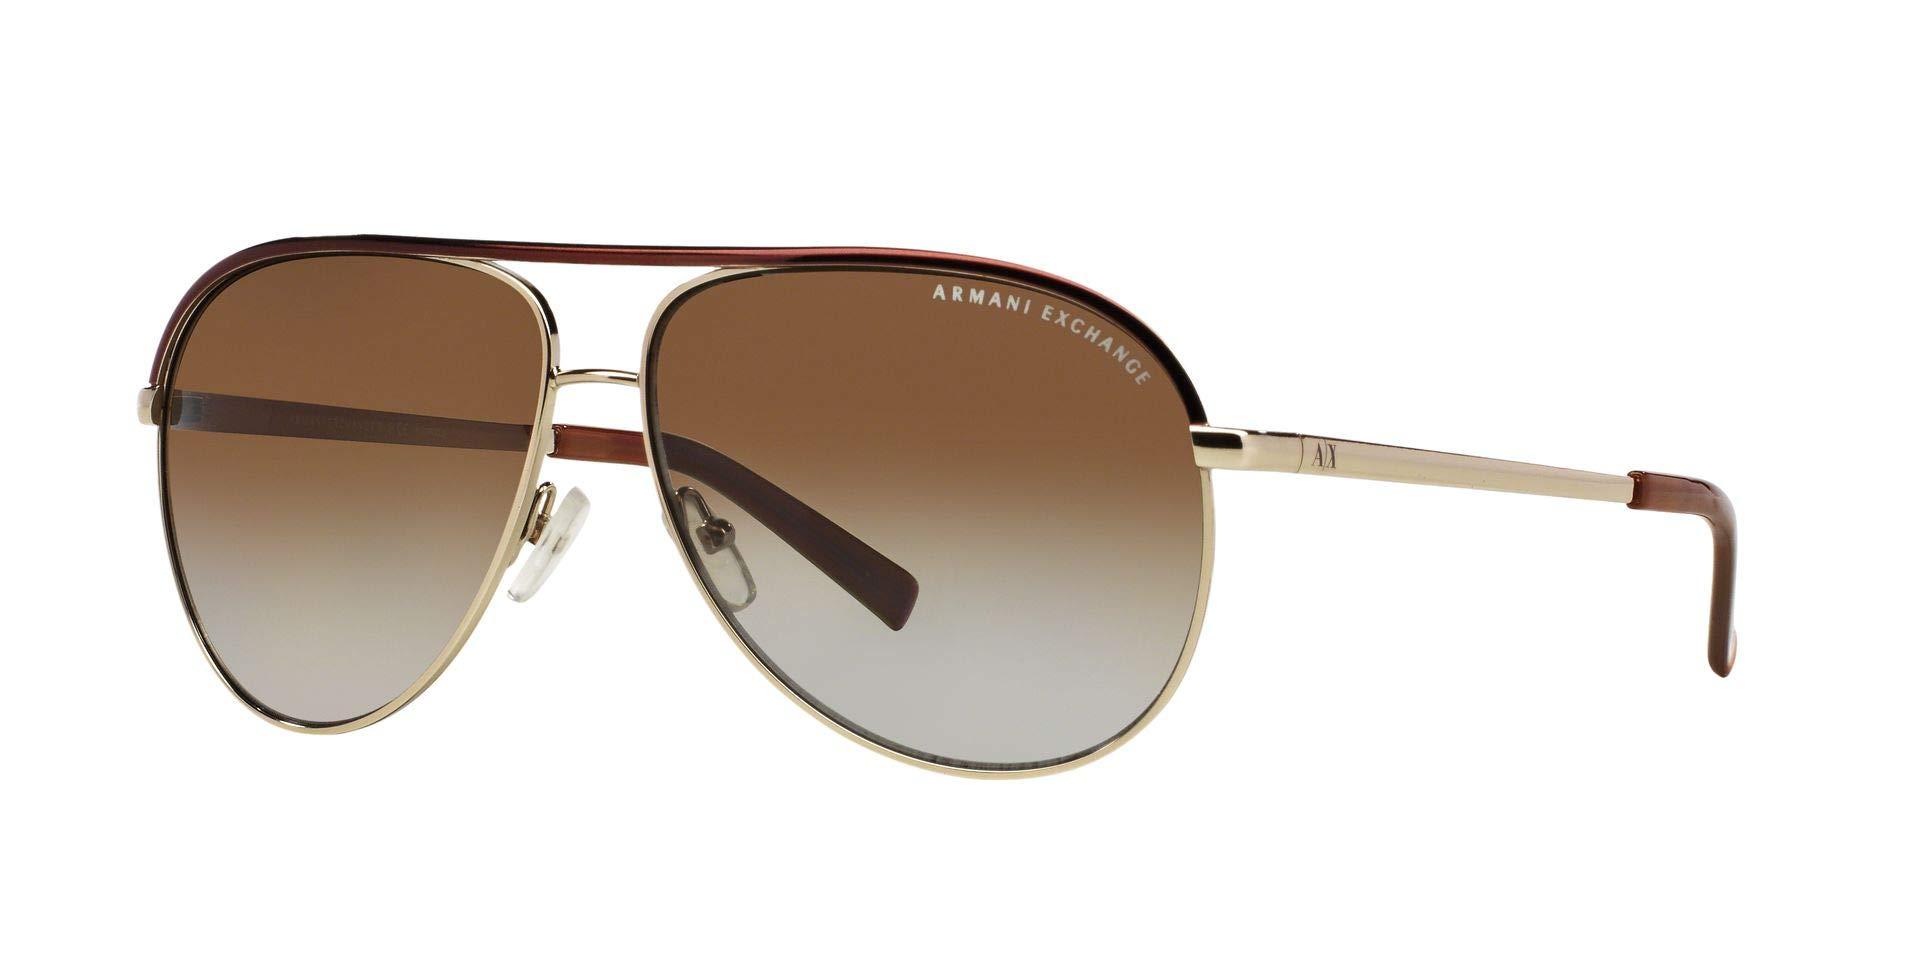 Armani Exchange Metal Unisex Polarized Aviator Sunglasses, Light Gold/Dark Brown, 61 mm by A|X Armani Exchange (Image #3)